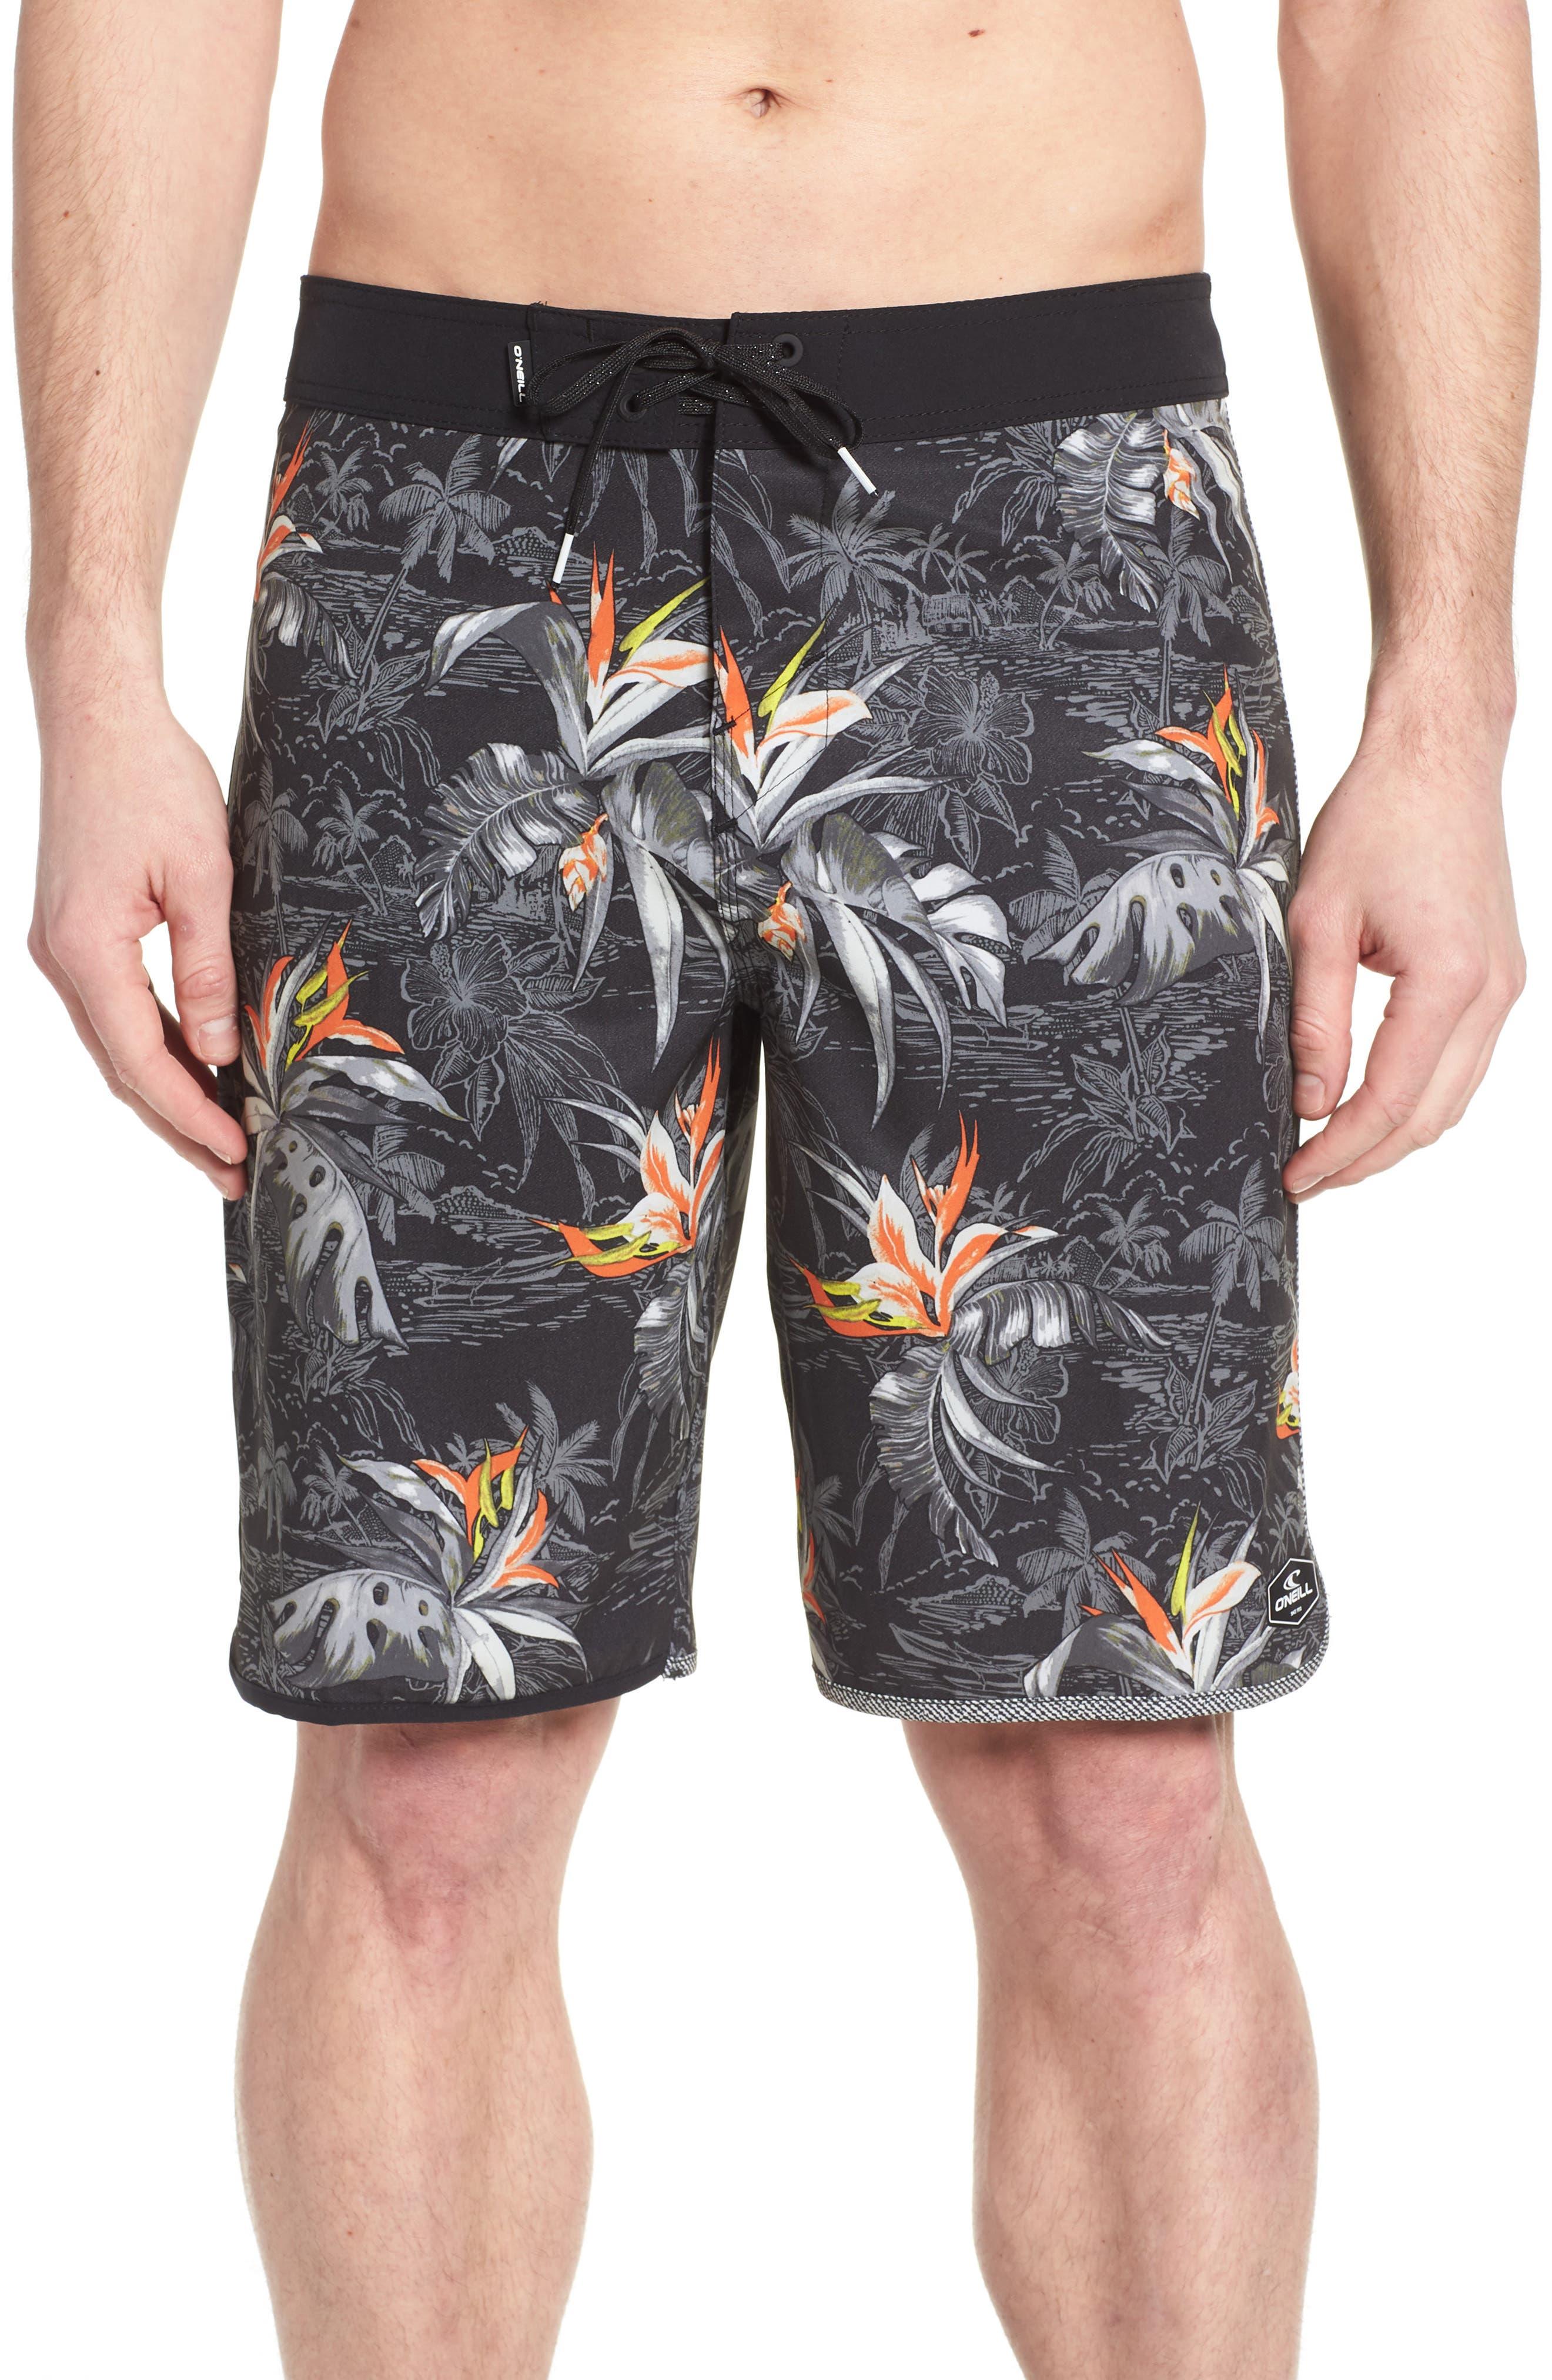 O'NEILL Hyperfreak Islander Board Shorts, Main, color, 001